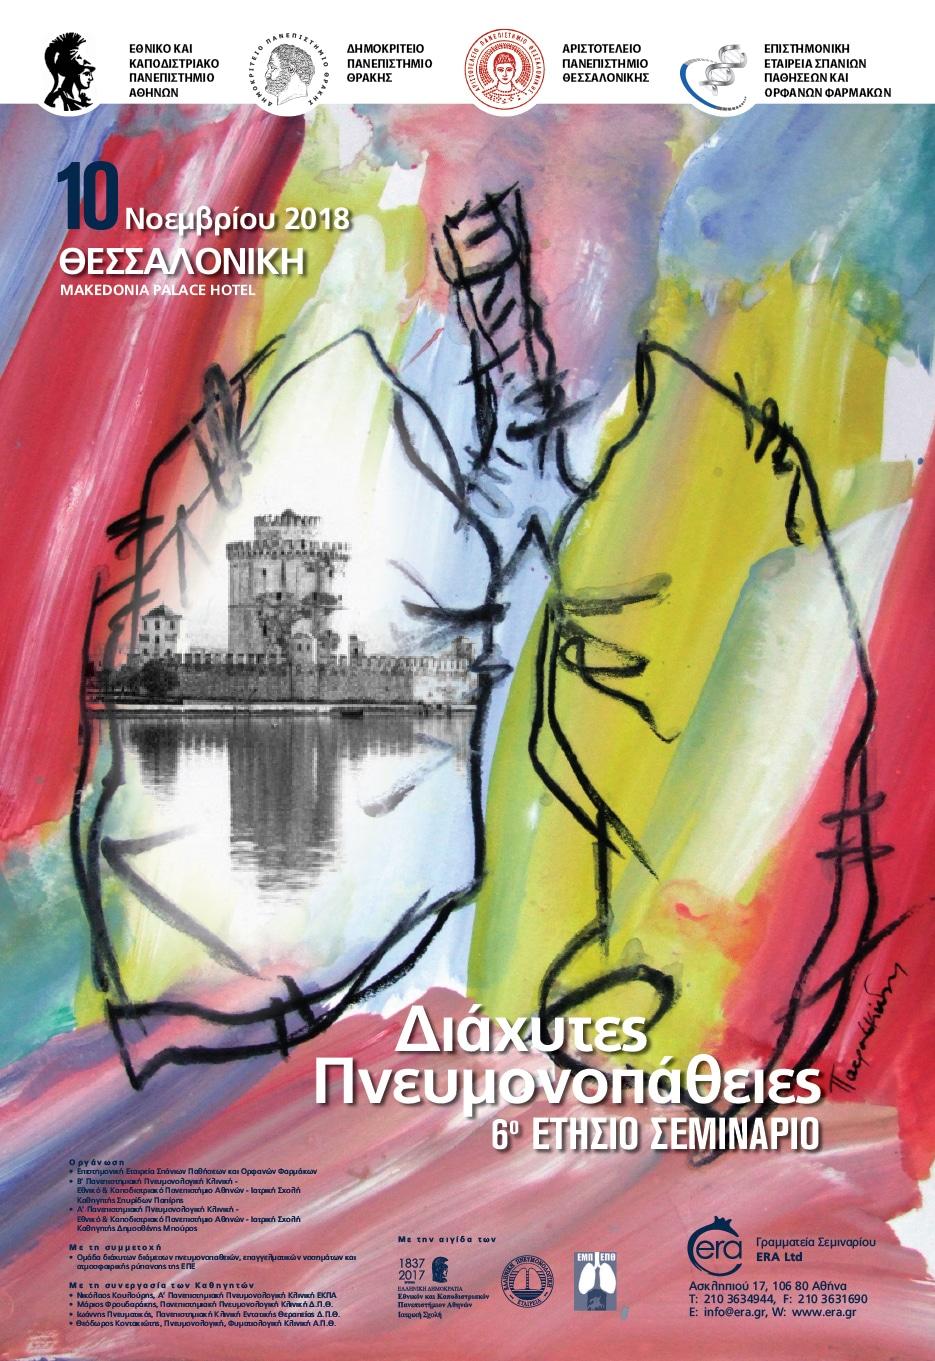 6th Seminar on Diffuse Lung Diseases | ERA Ltd. Congress Organizers